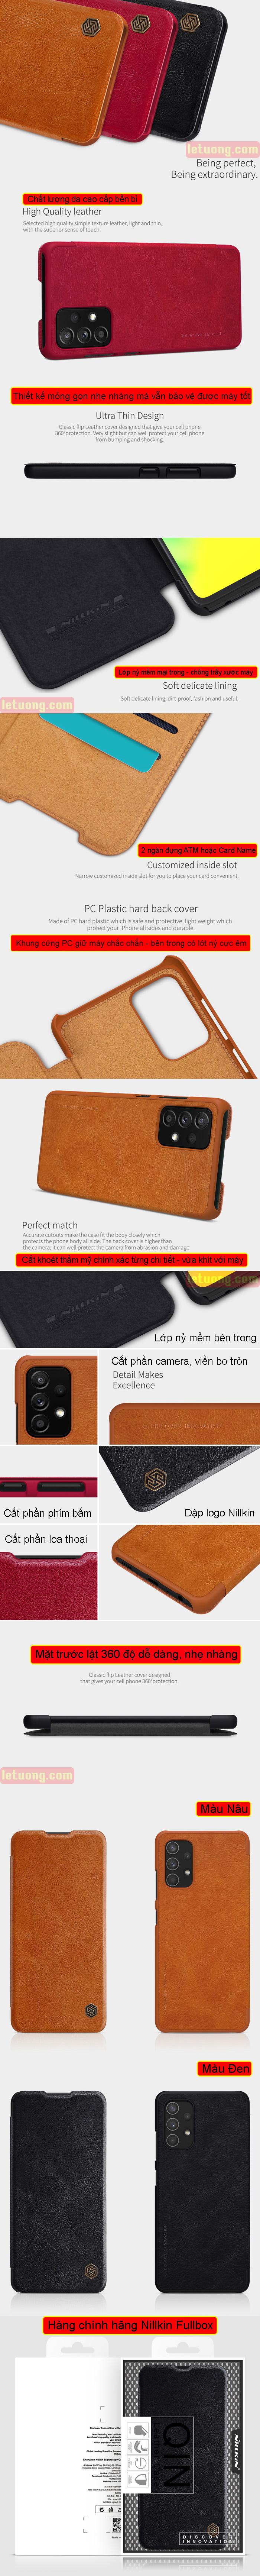 Bao da Samsung Galaxy A32 4G Nillkin Qin Leather vân gỗ - cổ điển 2